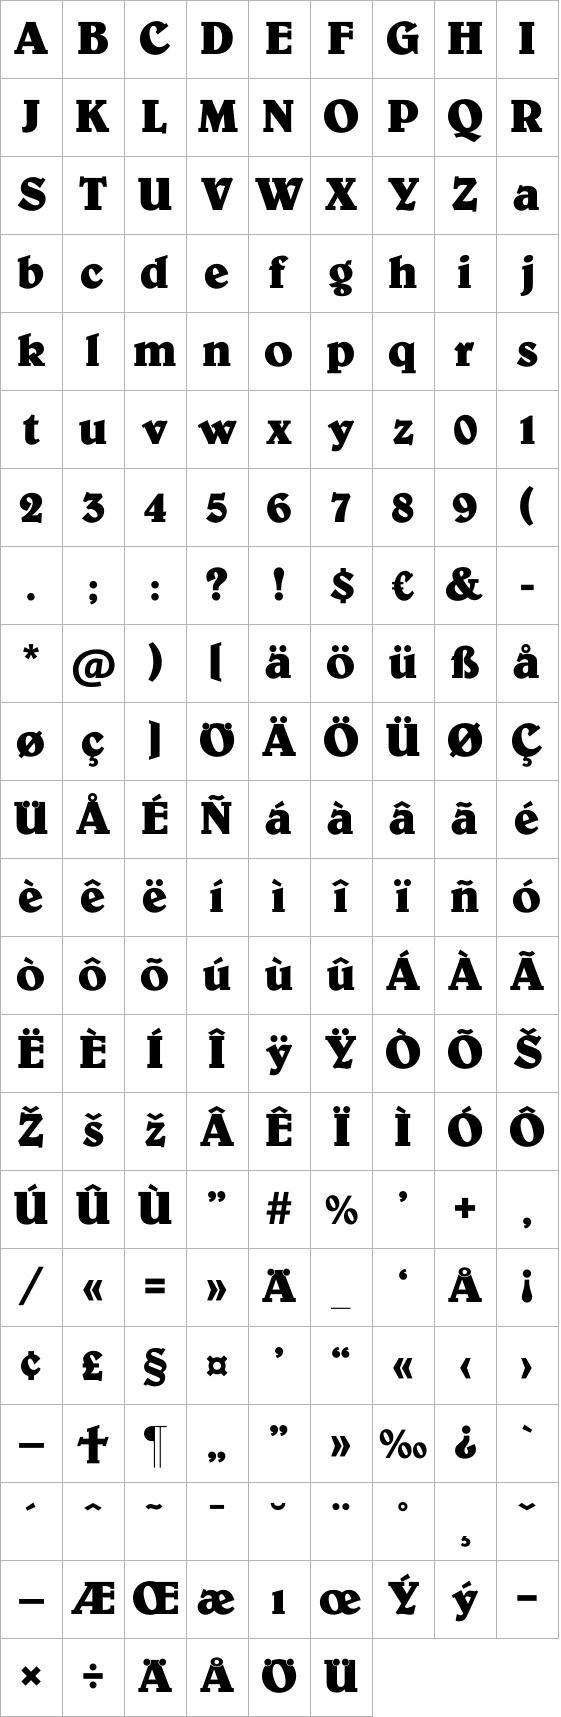 patagonia lettering craft ideas pinterest patagonia frat rh pinterest com Patagonia Logo Black and White Patagonia Logo Font Name